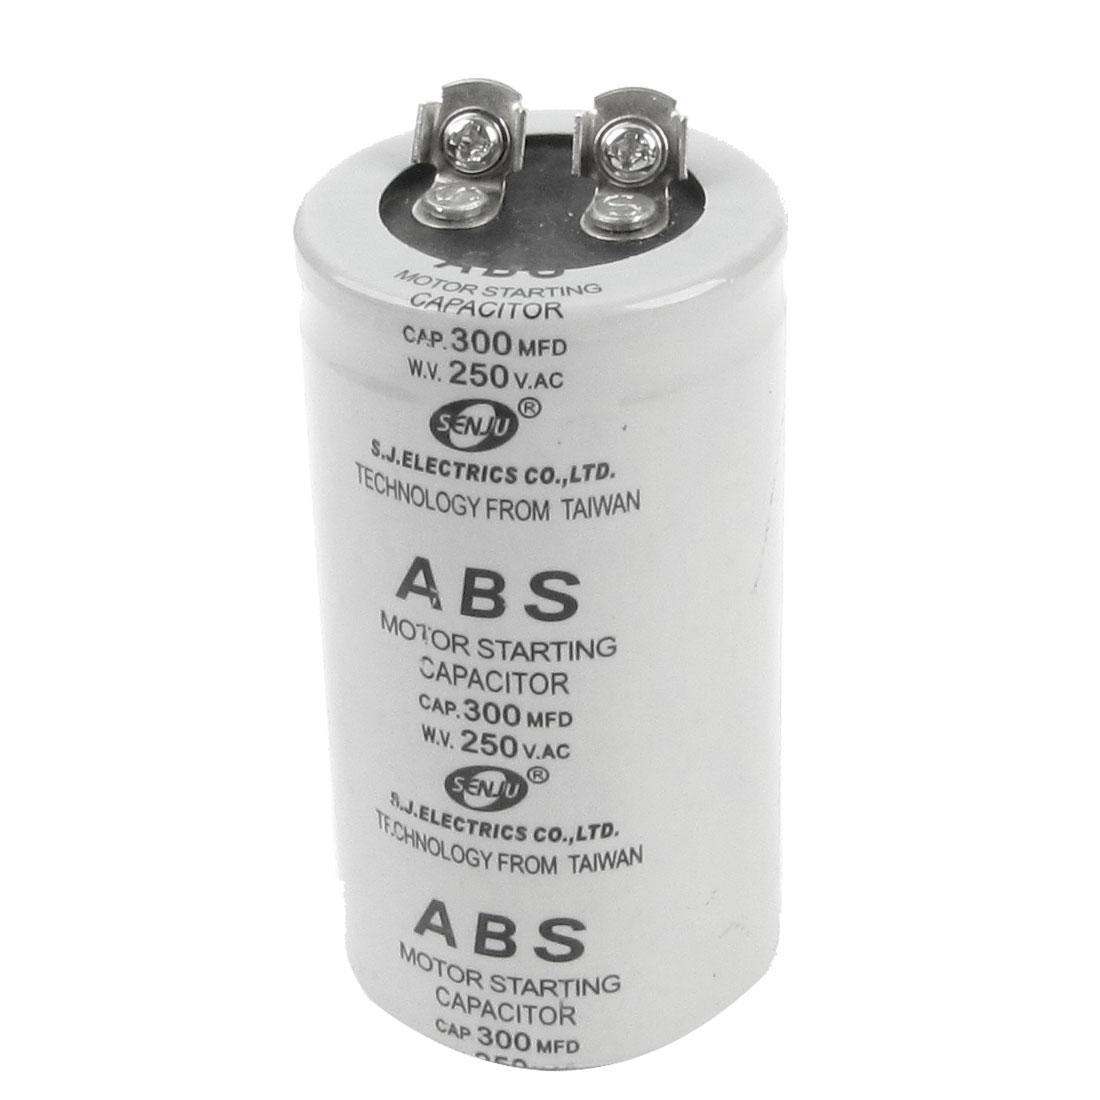 AC 250V 300MFD 300uF Capacitance Round Motor Starting Capacitor Gray